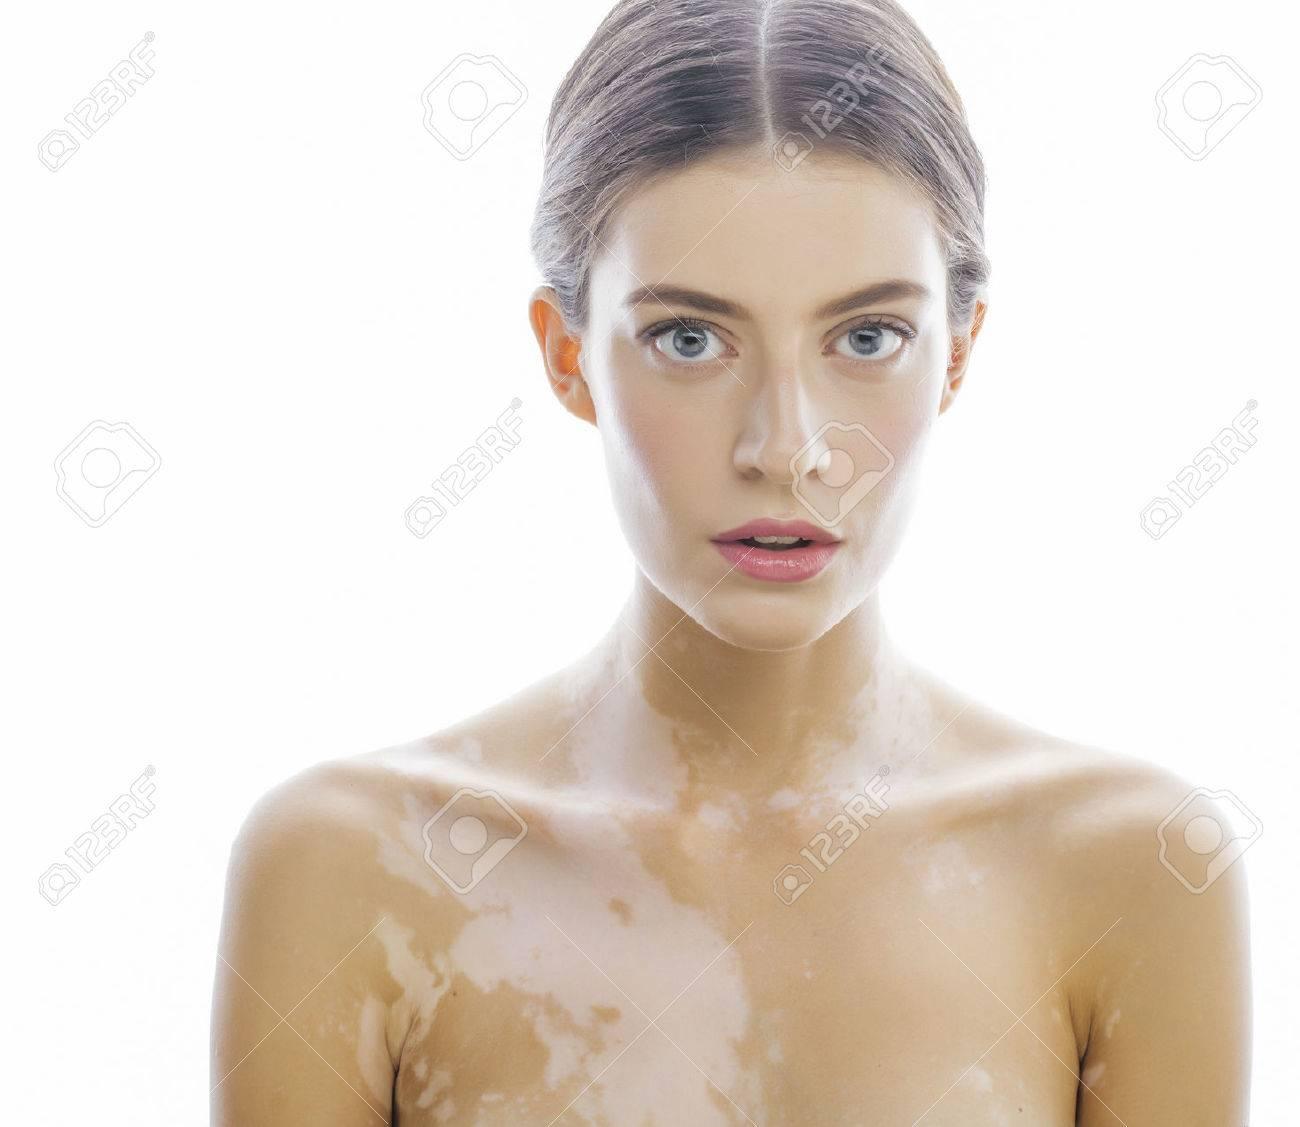 http://n3.datasn.io/data/api/v1/n3zm/image_of_skin_disease_5/main/skin_disease_image_download//45/70/51/98/45705198d89136096cd1cca101d850c0cb81e6a1.jpg